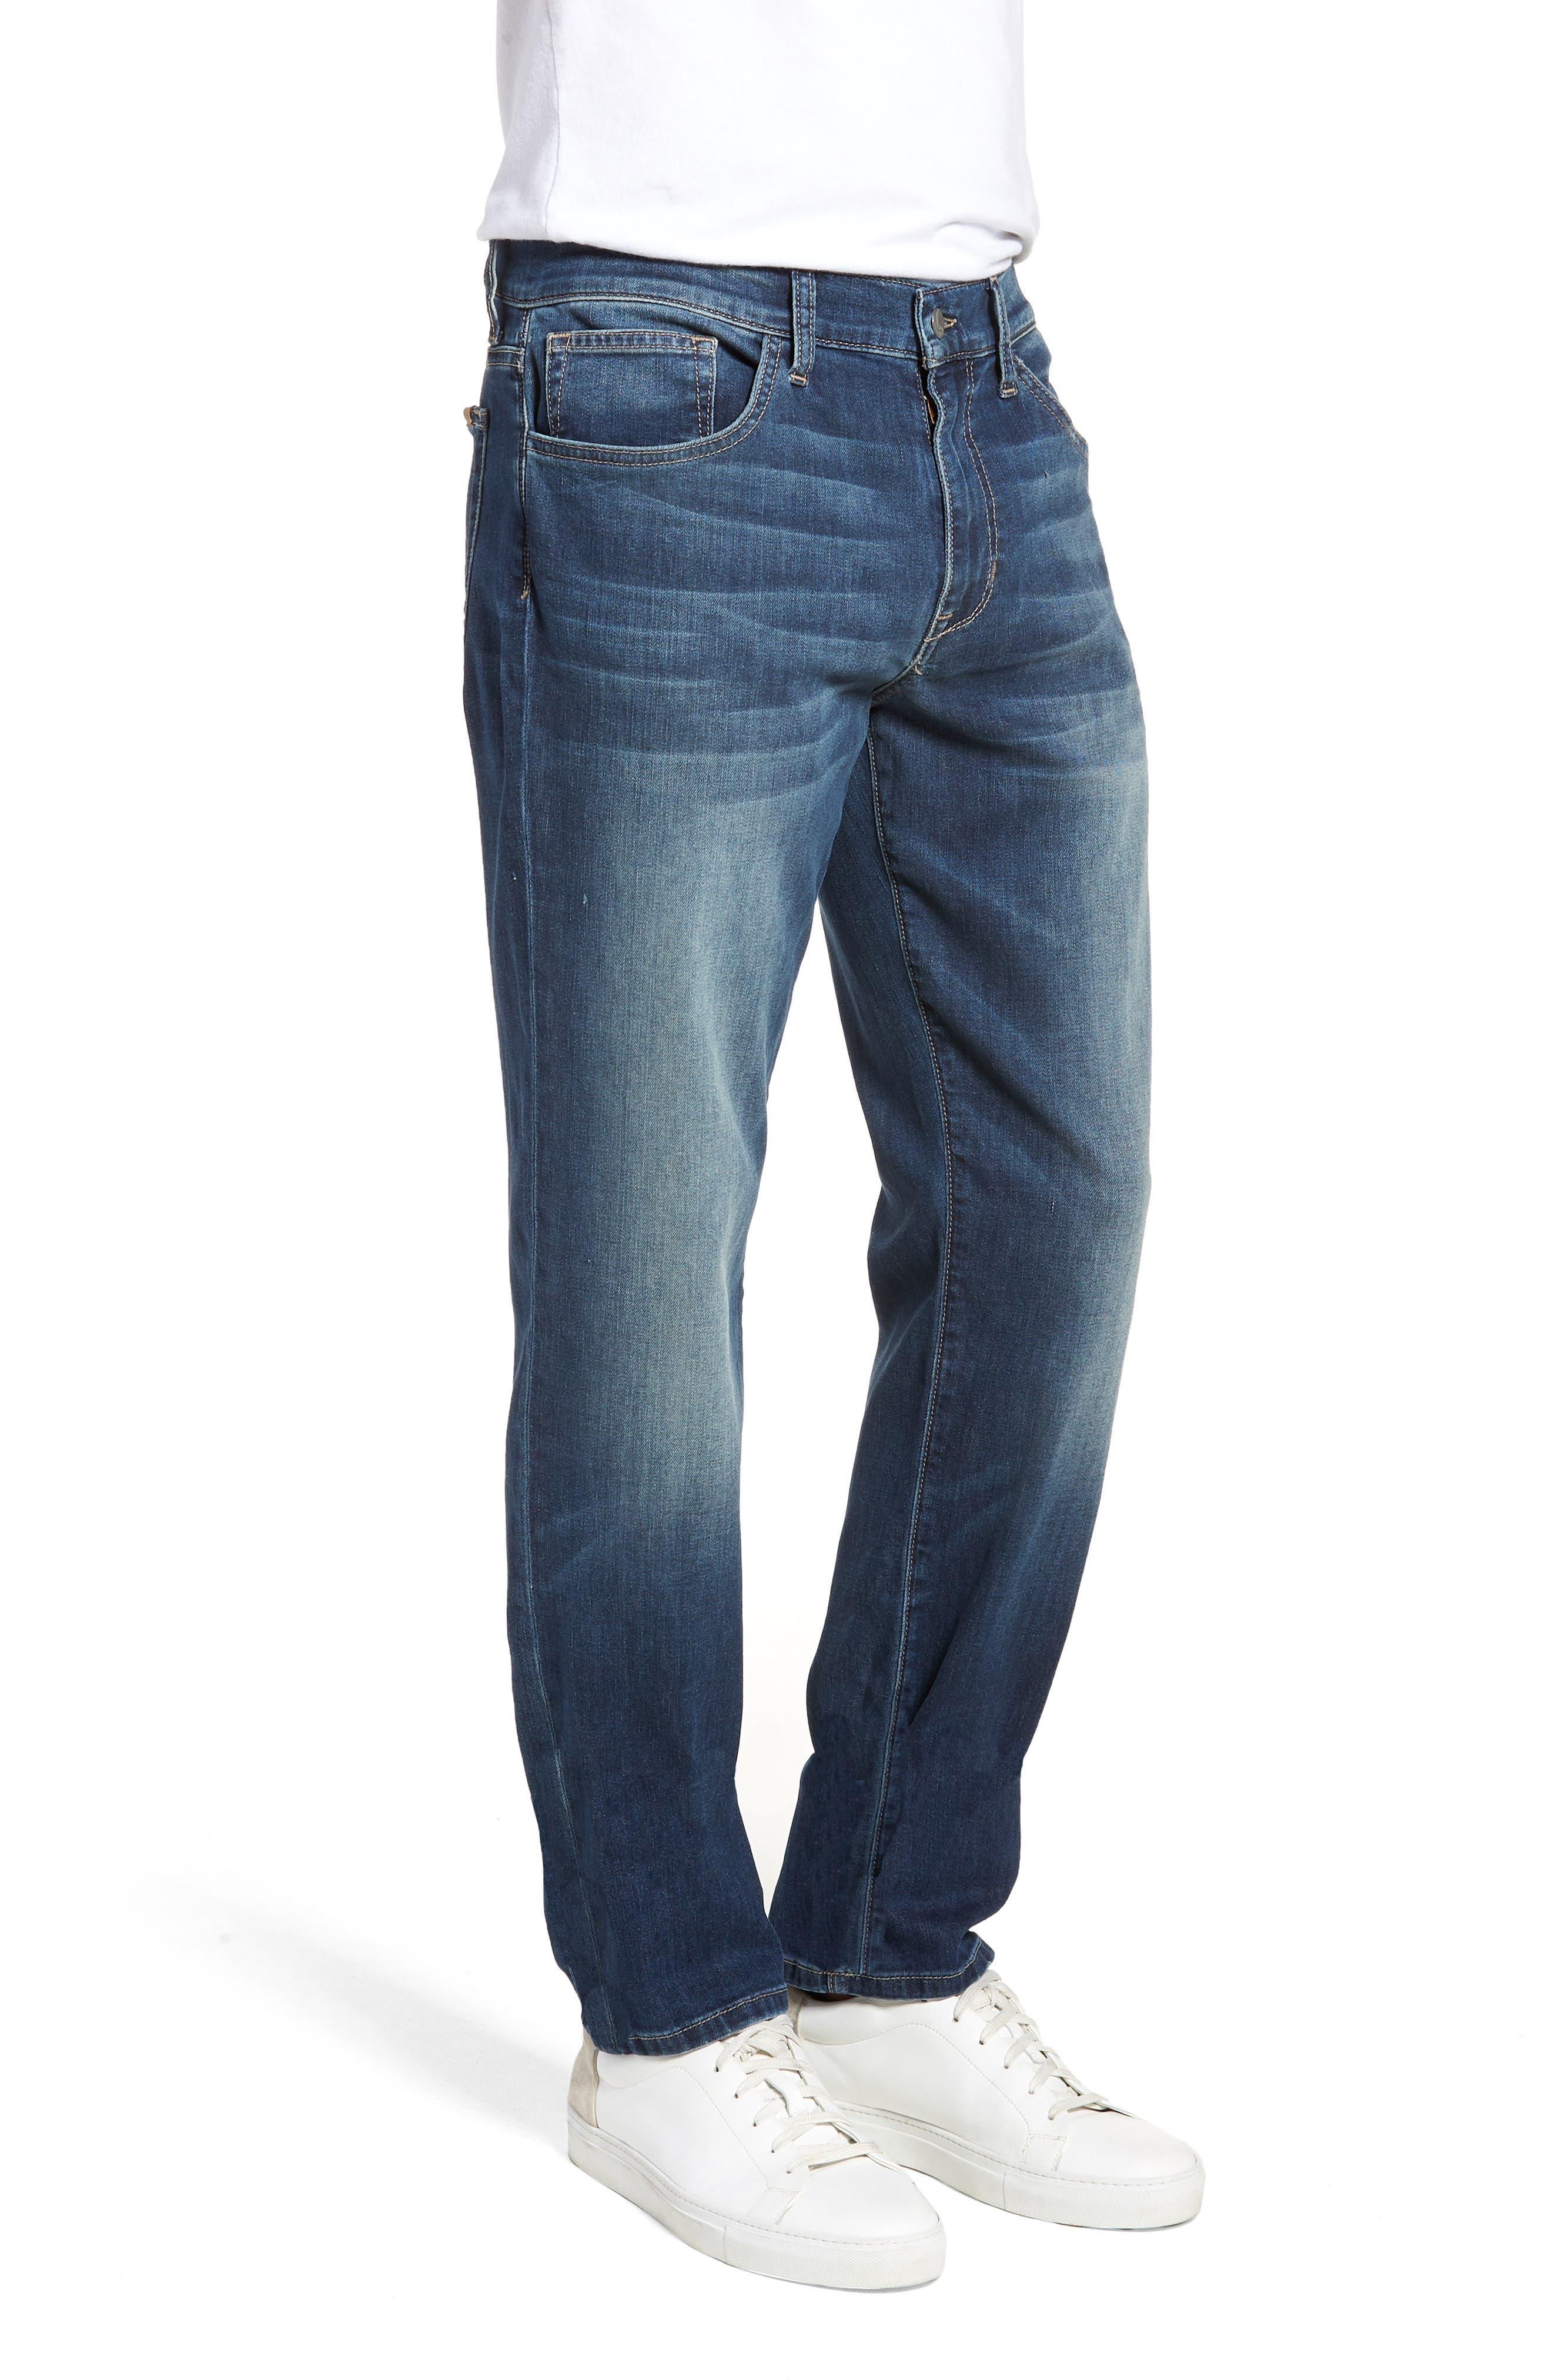 Brixton Slim Straight Fit Jeans,                             Alternate thumbnail 3, color,                             400